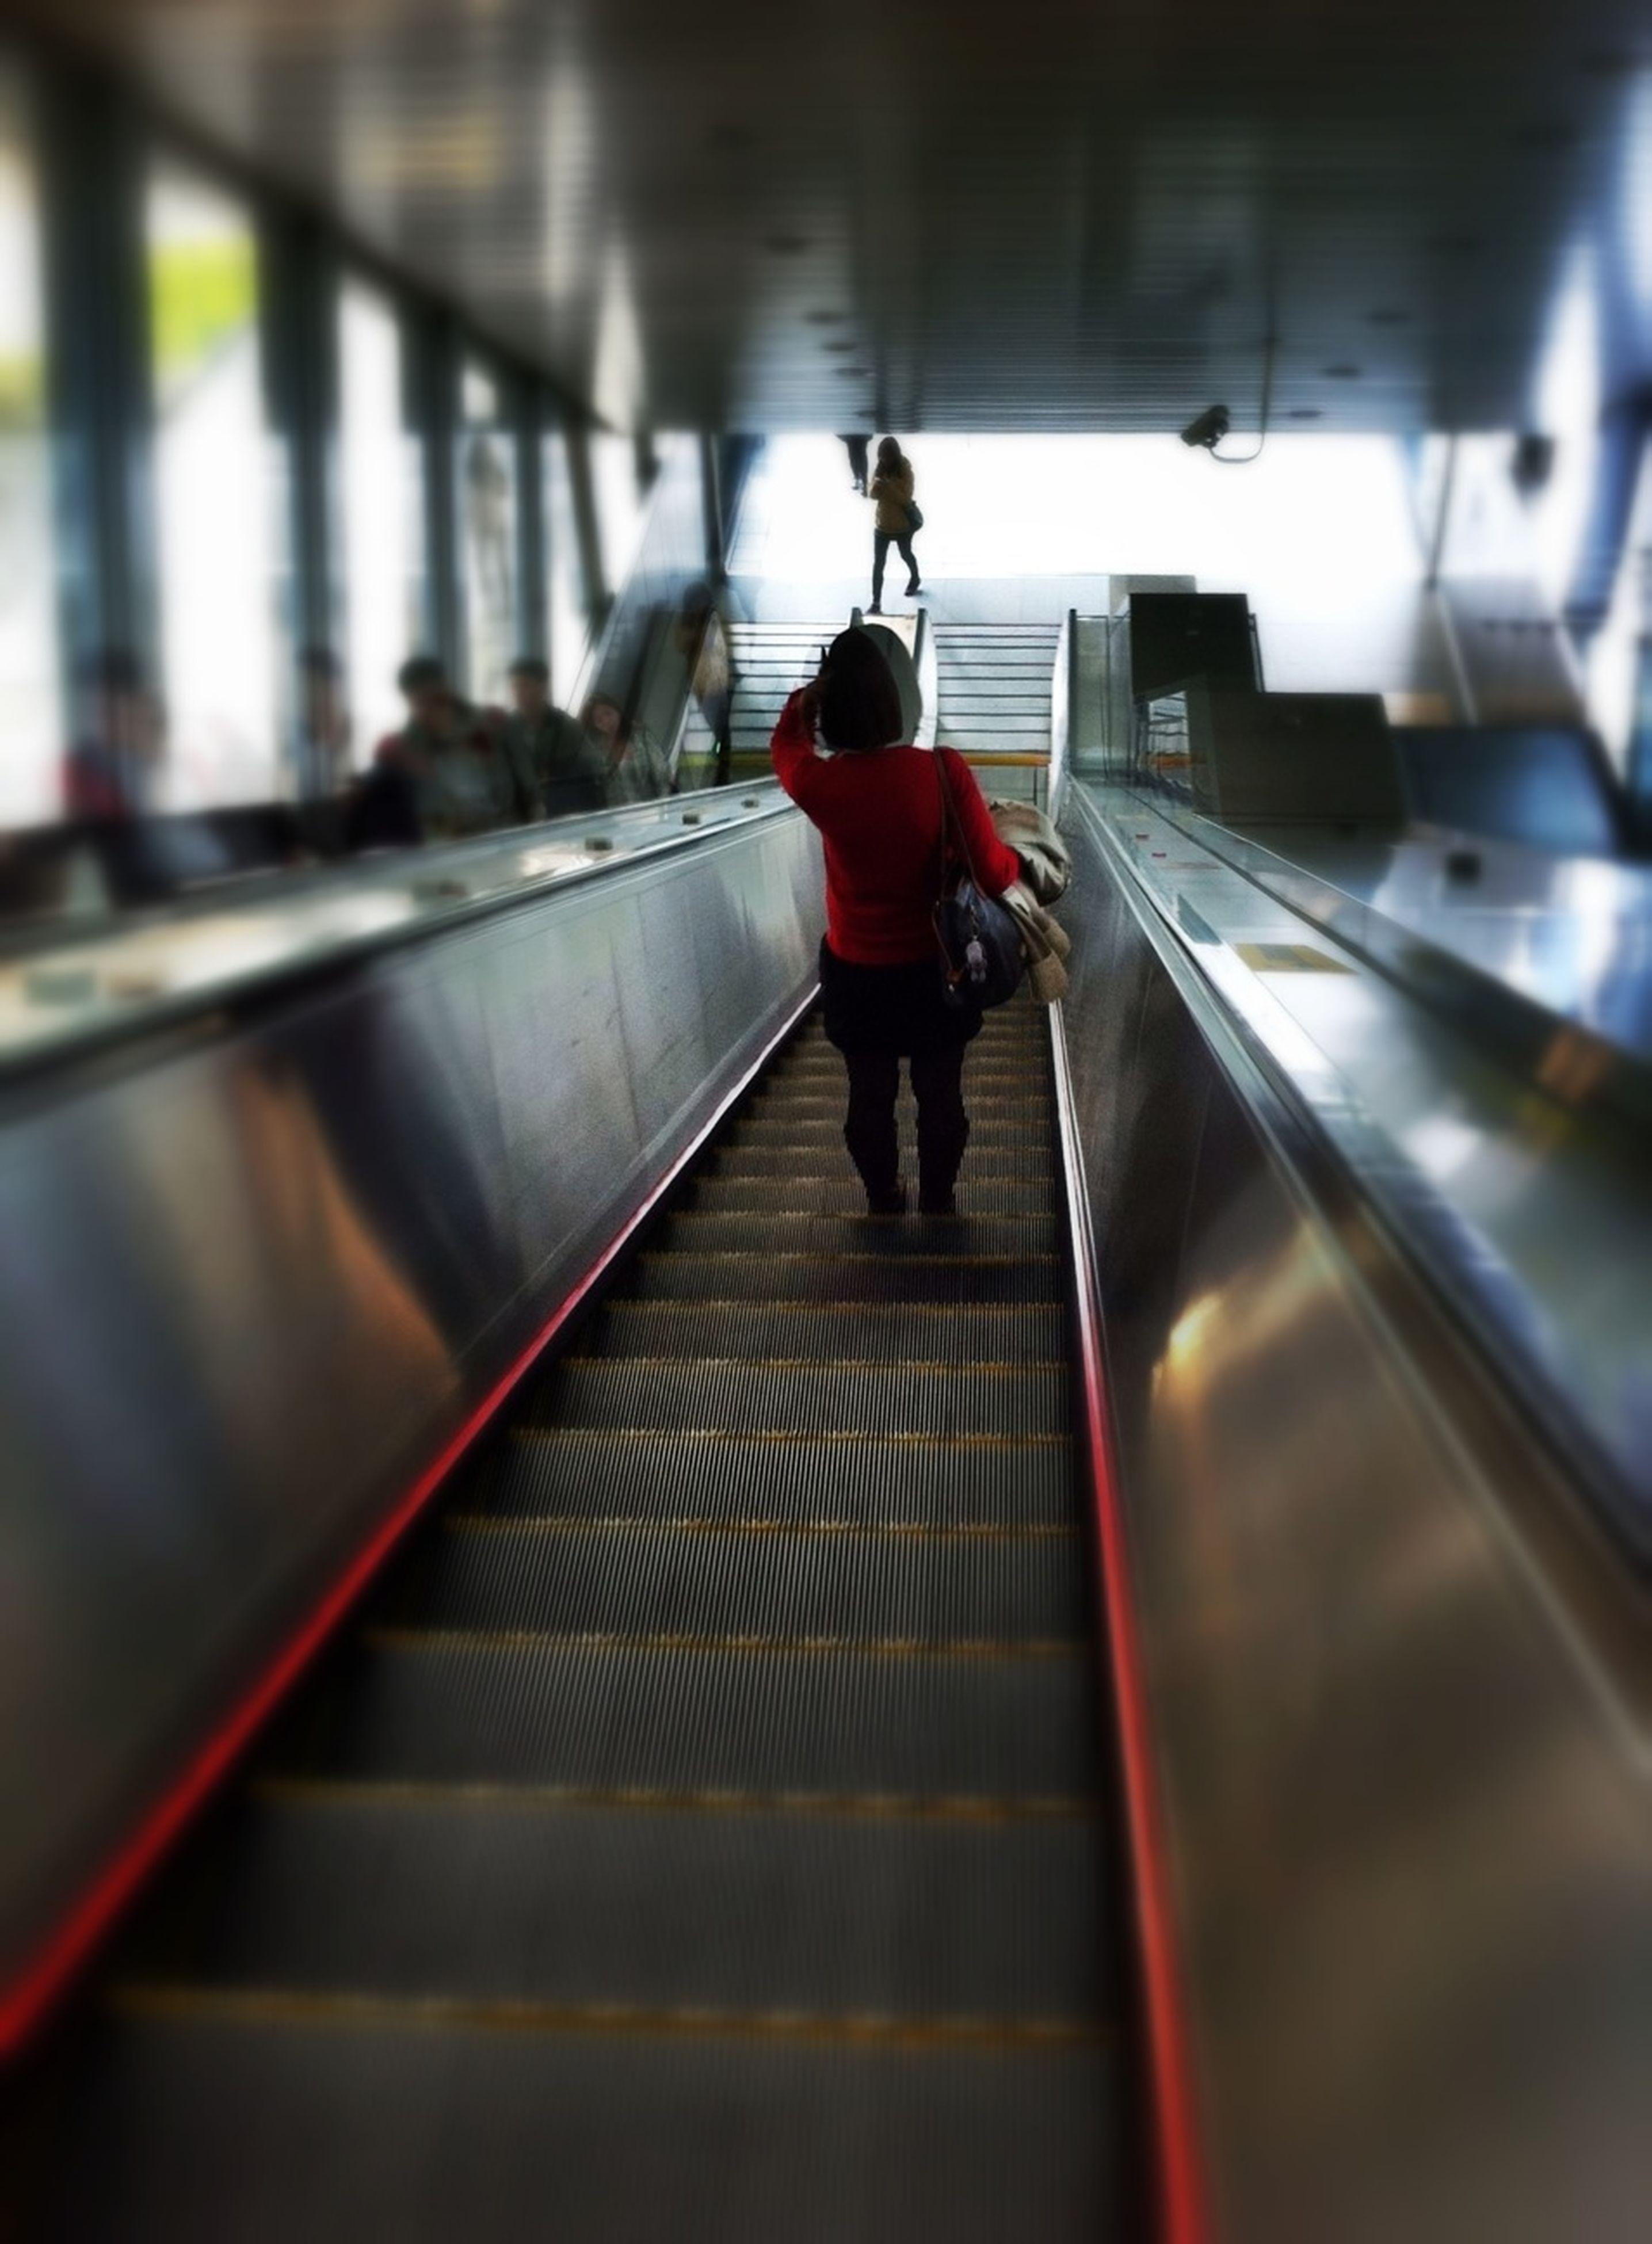 indoors, full length, lifestyles, transportation, escalator, walking, men, rear view, motion, the way forward, railing, on the move, subway station, illuminated, subway, blurred motion, travel, railroad station